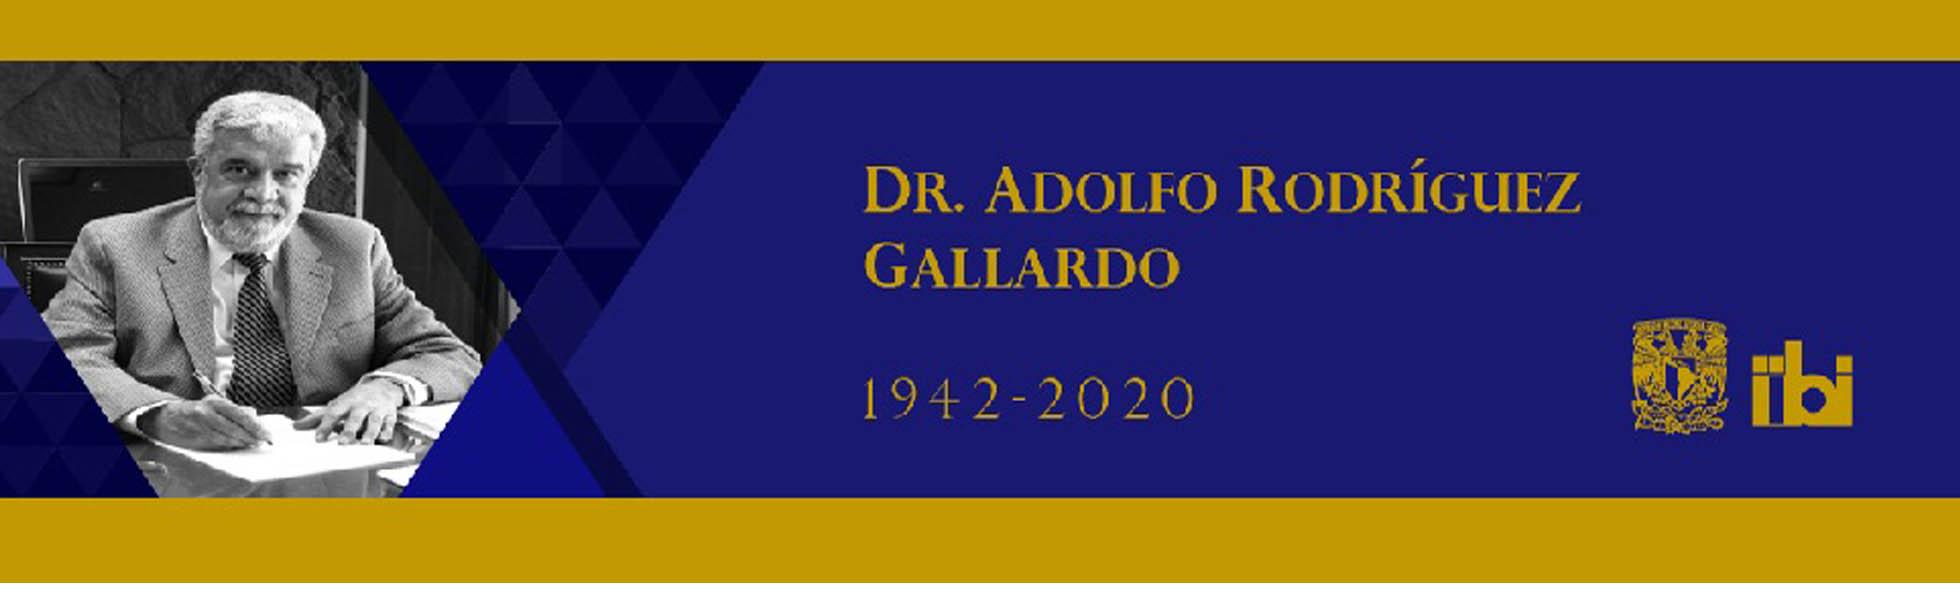 Adolfo Rodríguez Gallardo